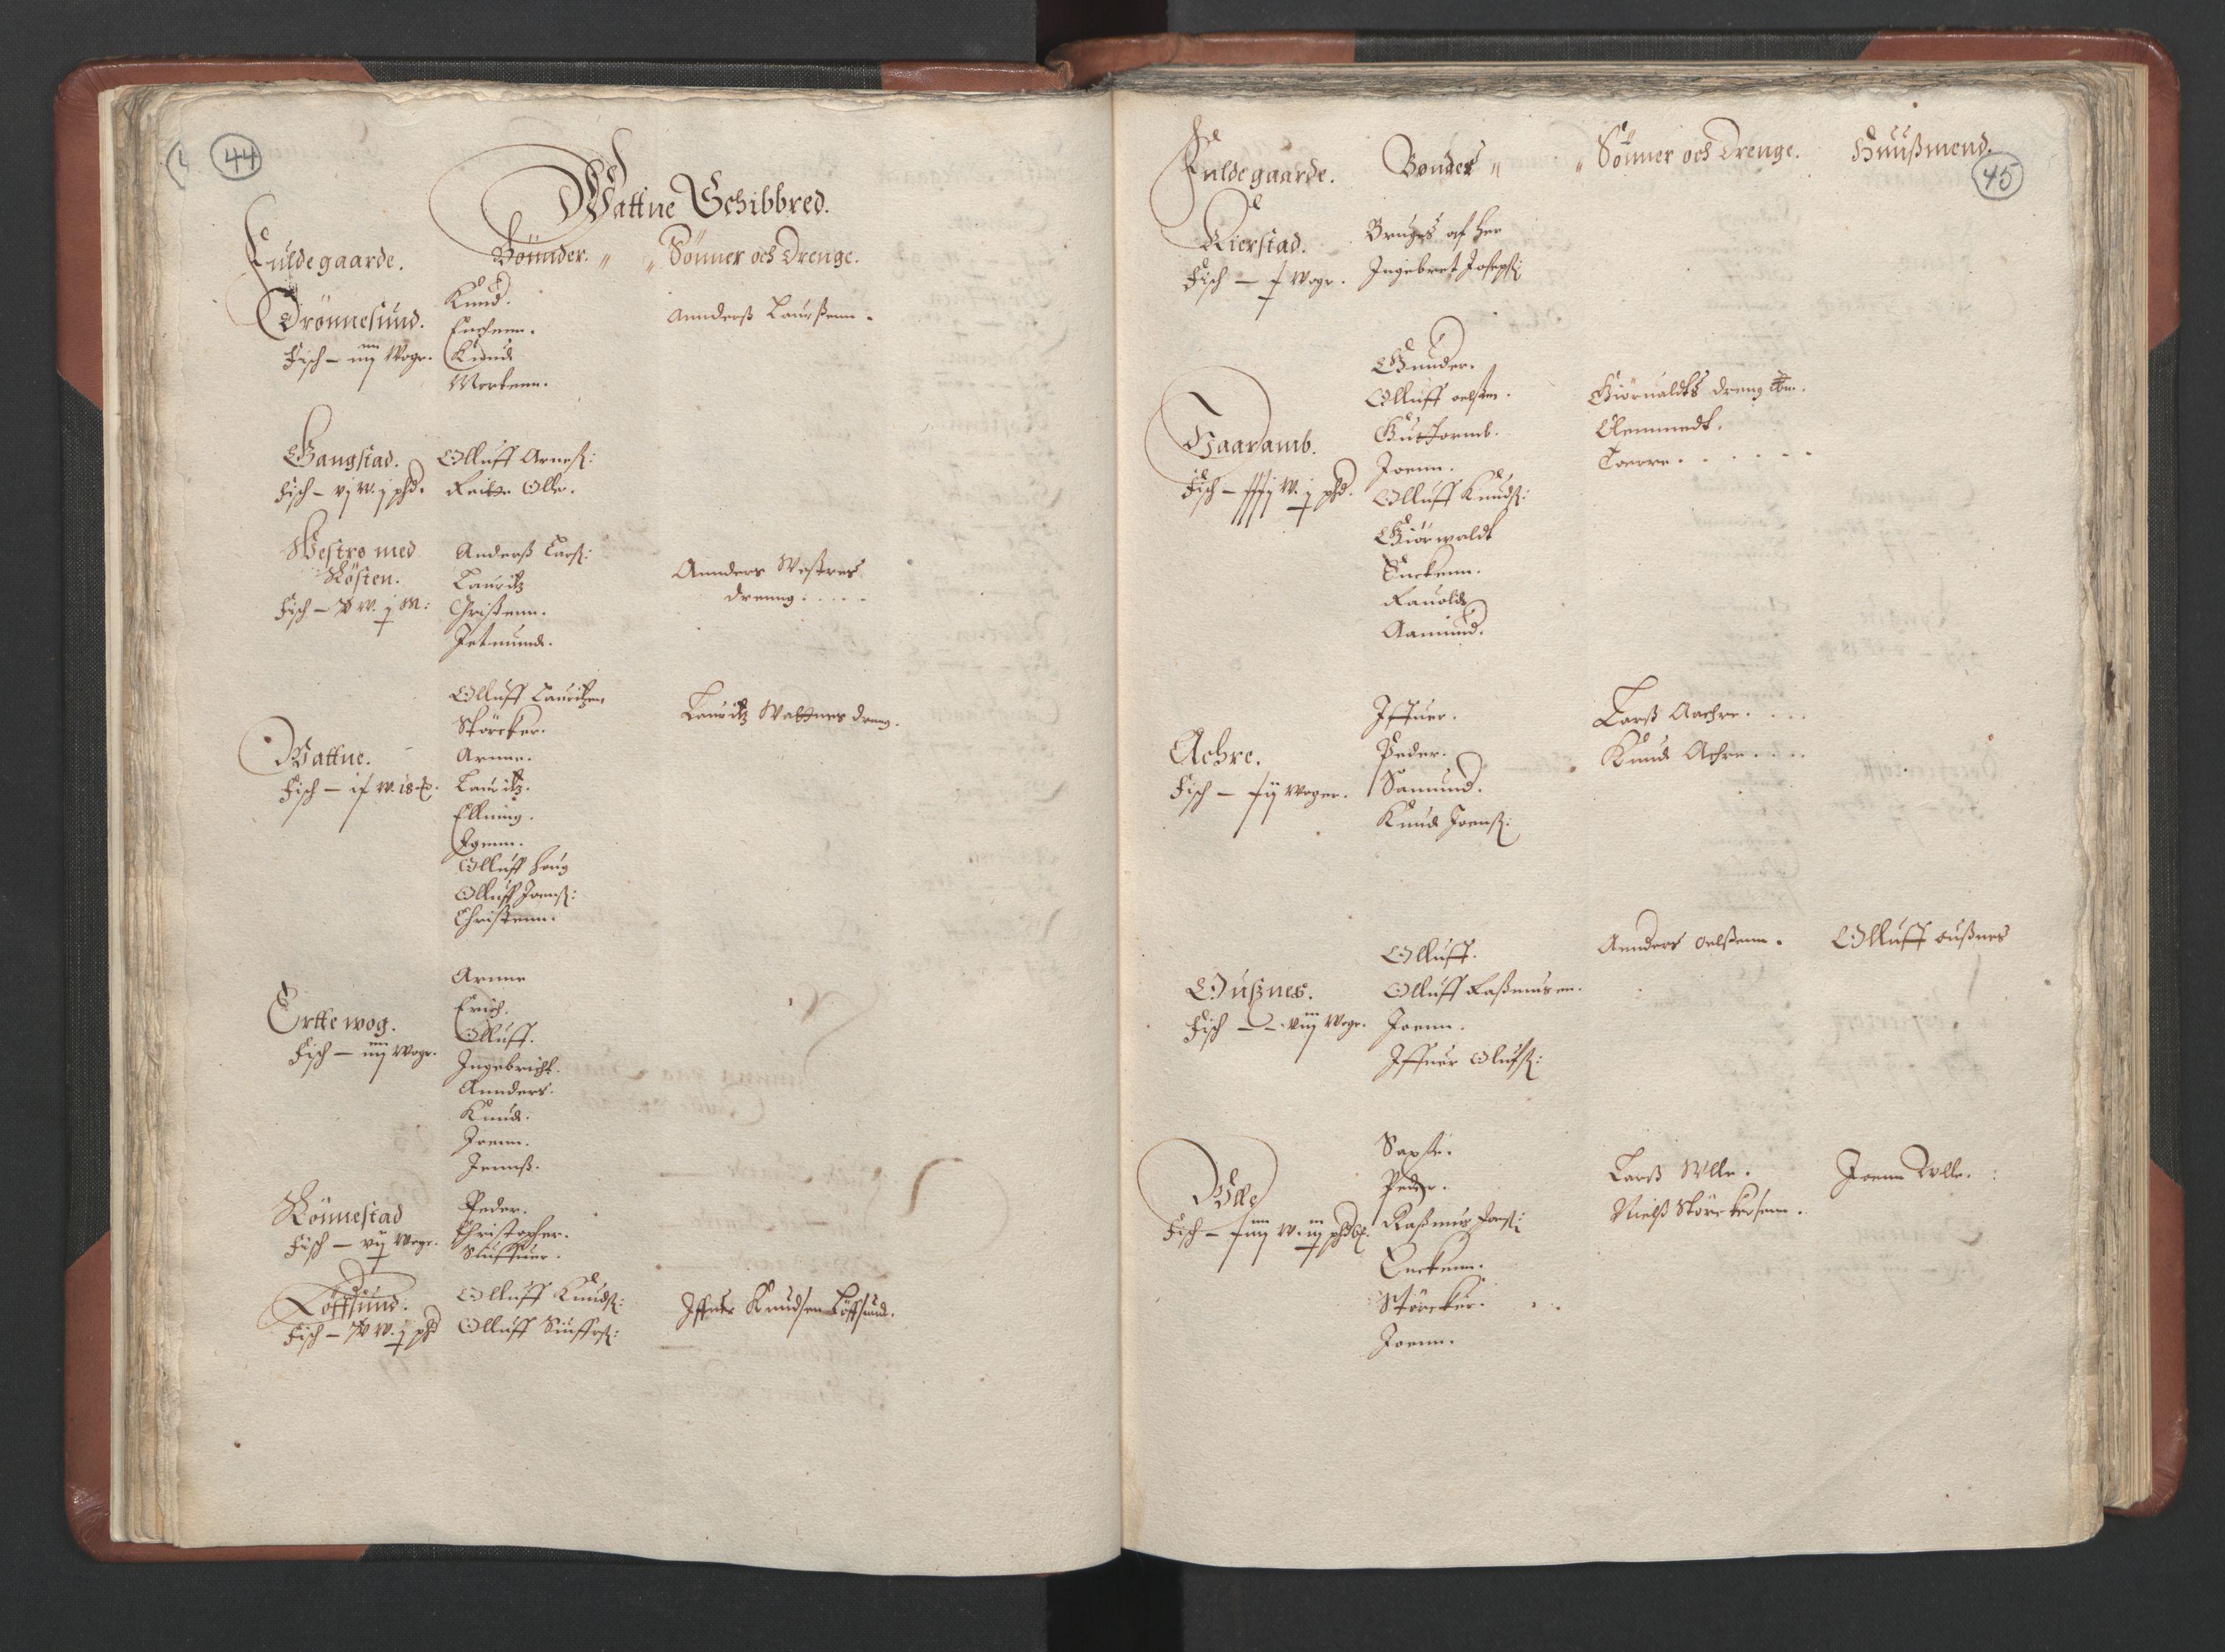 RA, Fogdenes og sorenskrivernes manntall 1664-1666, nr. 16: Romsdal fogderi og Sunnmøre fogderi, 1664-1665, s. 44-45